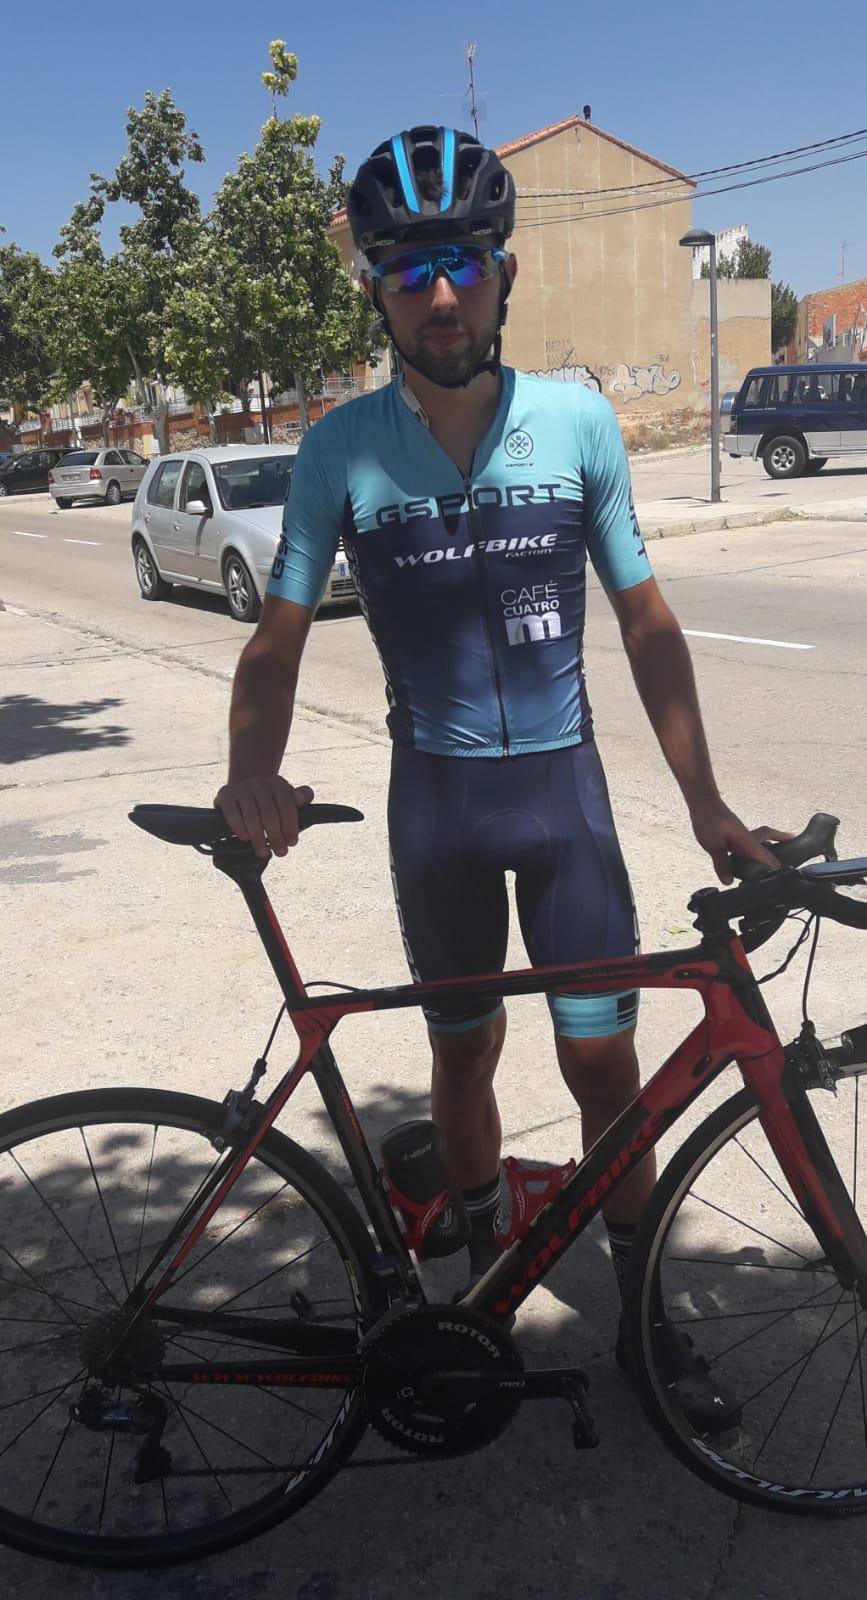 Aitor Escobar GSport Wolfbike